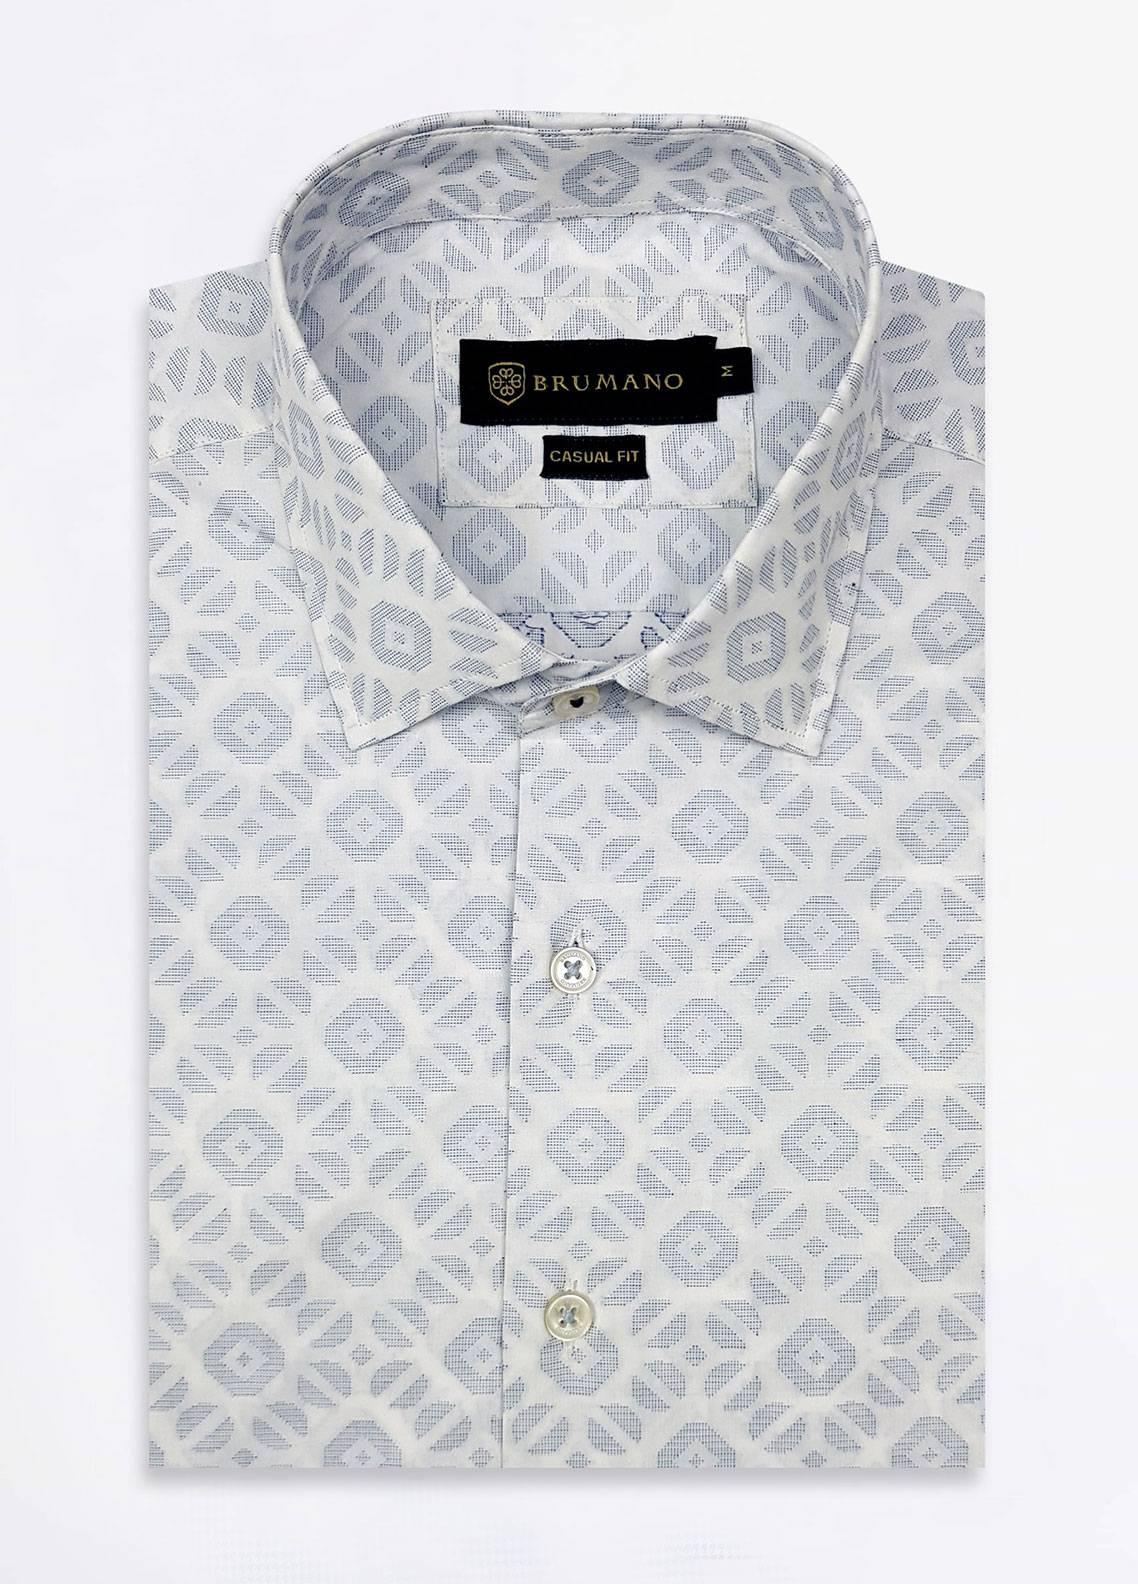 Brumano Cotton Formal Men Shirts - White BRM-520